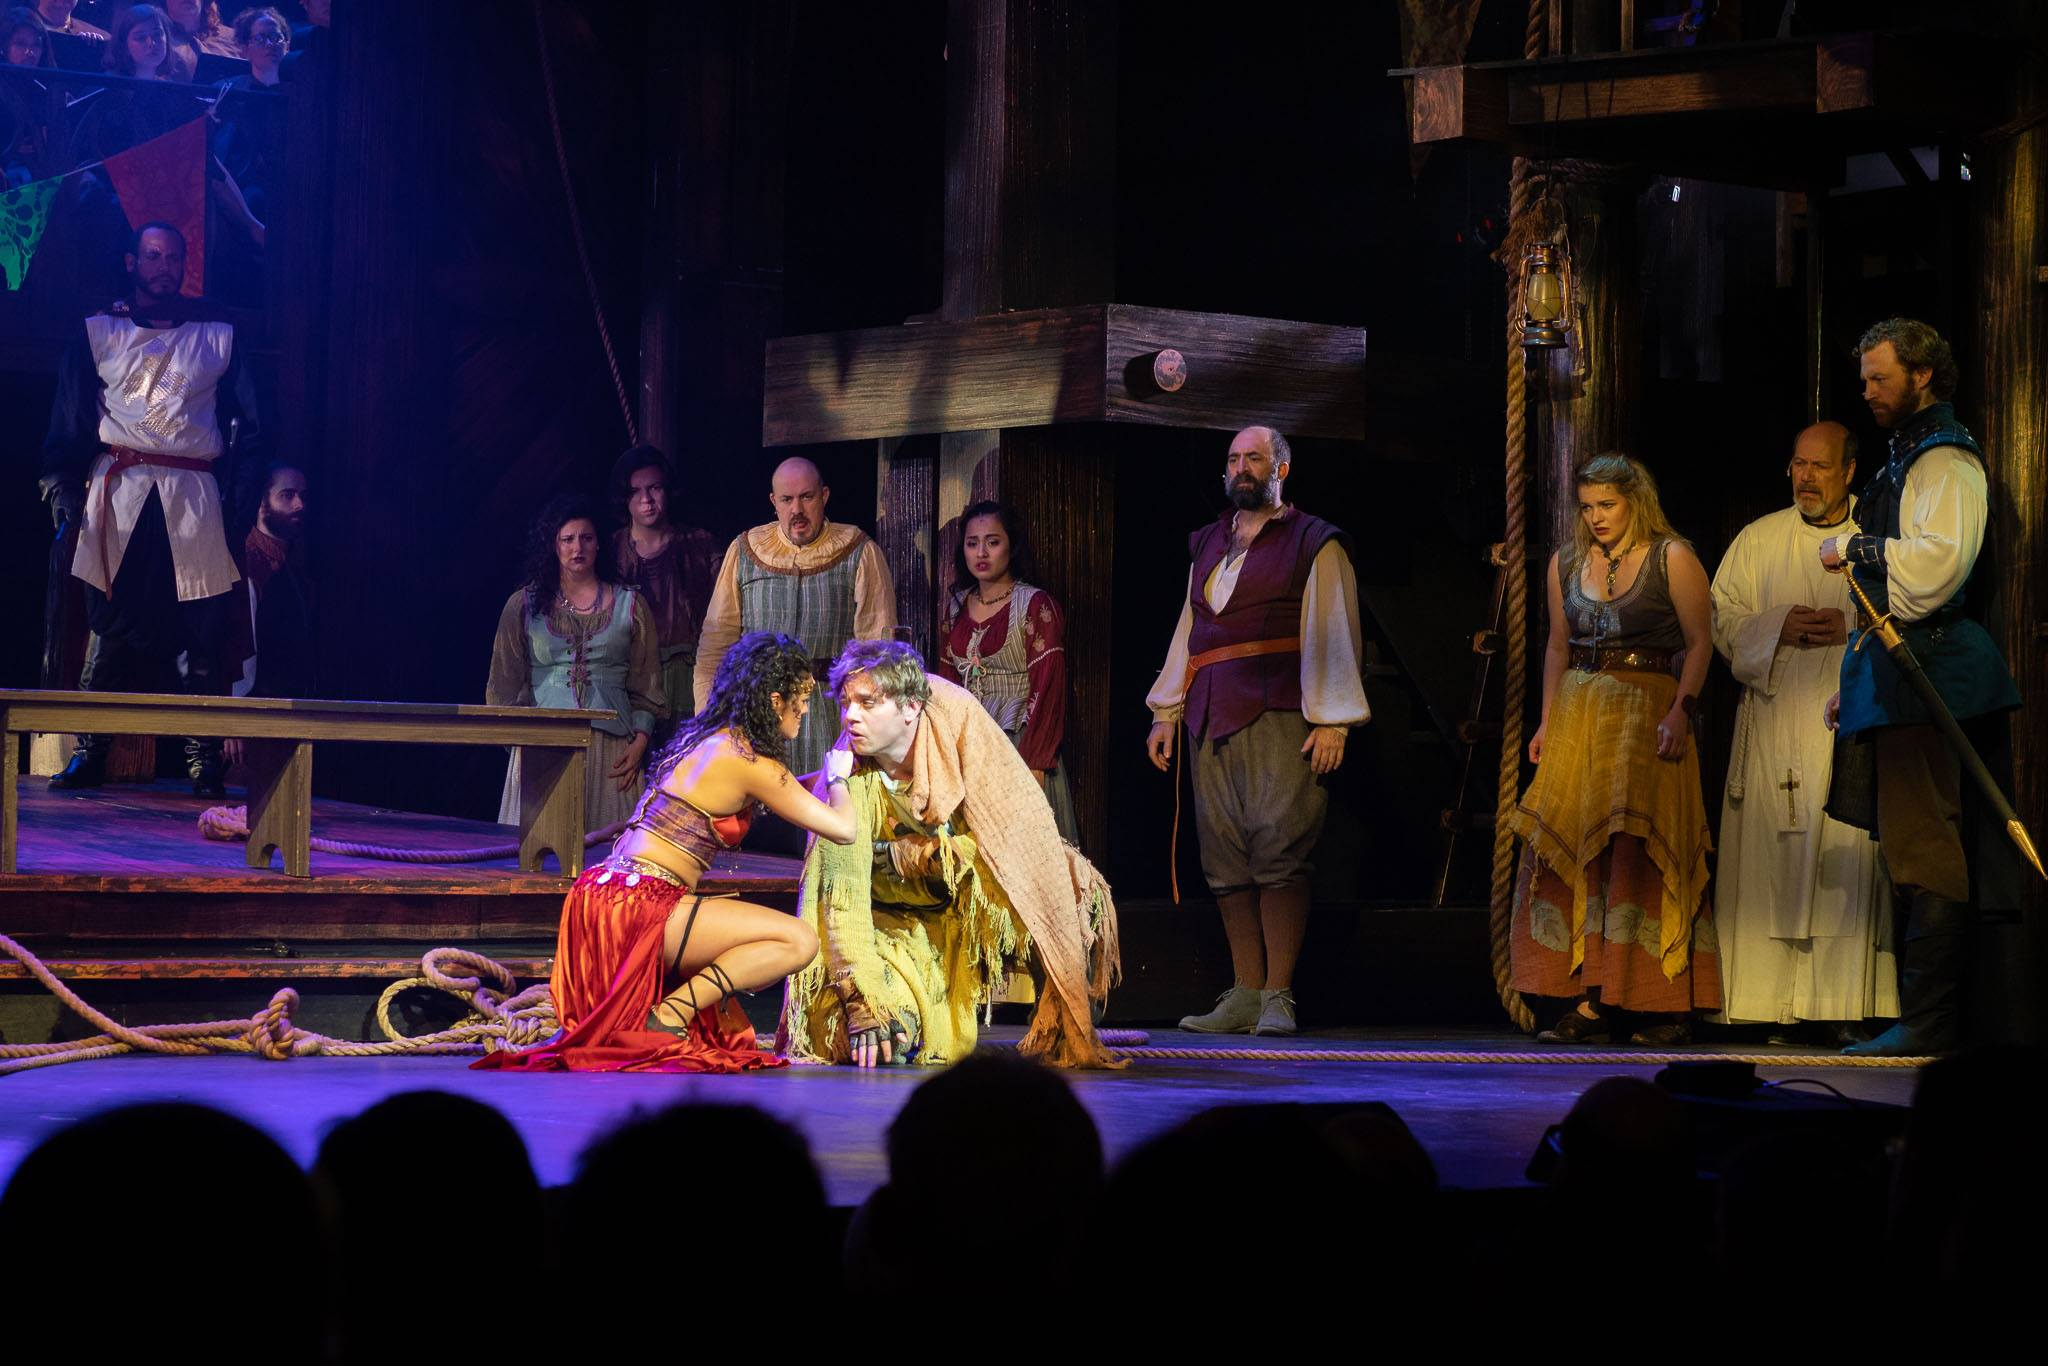 Kalyn West as Esmarelda with Nate Hackman as Quasimodo